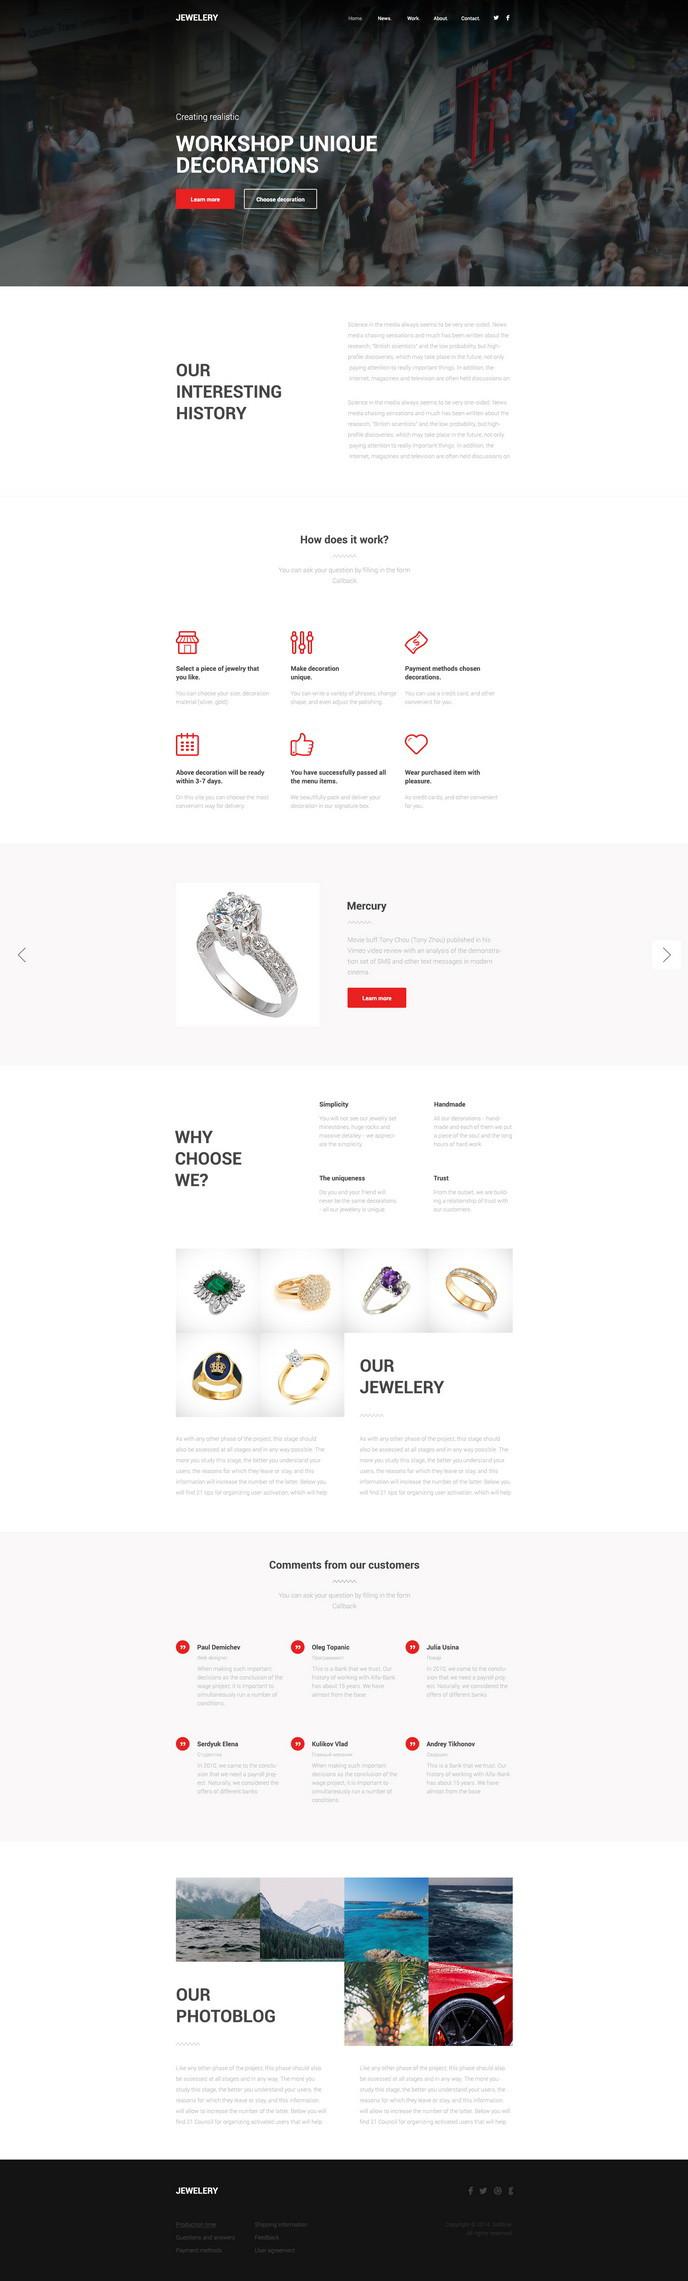 jewelery free psd theme